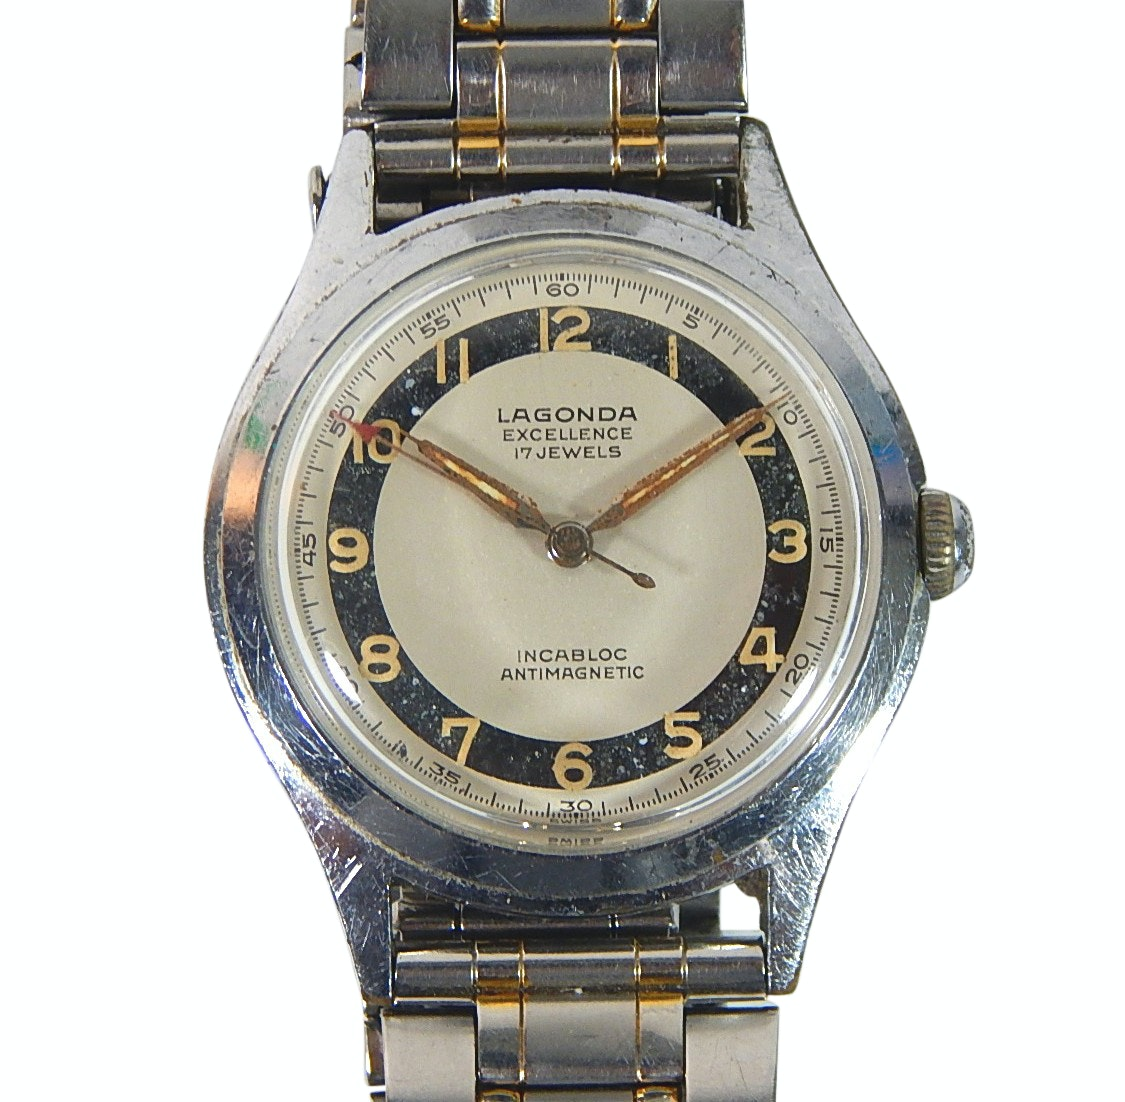 Lagonda Excellence 17 Jewel Incabloc Swiss Wristwatch